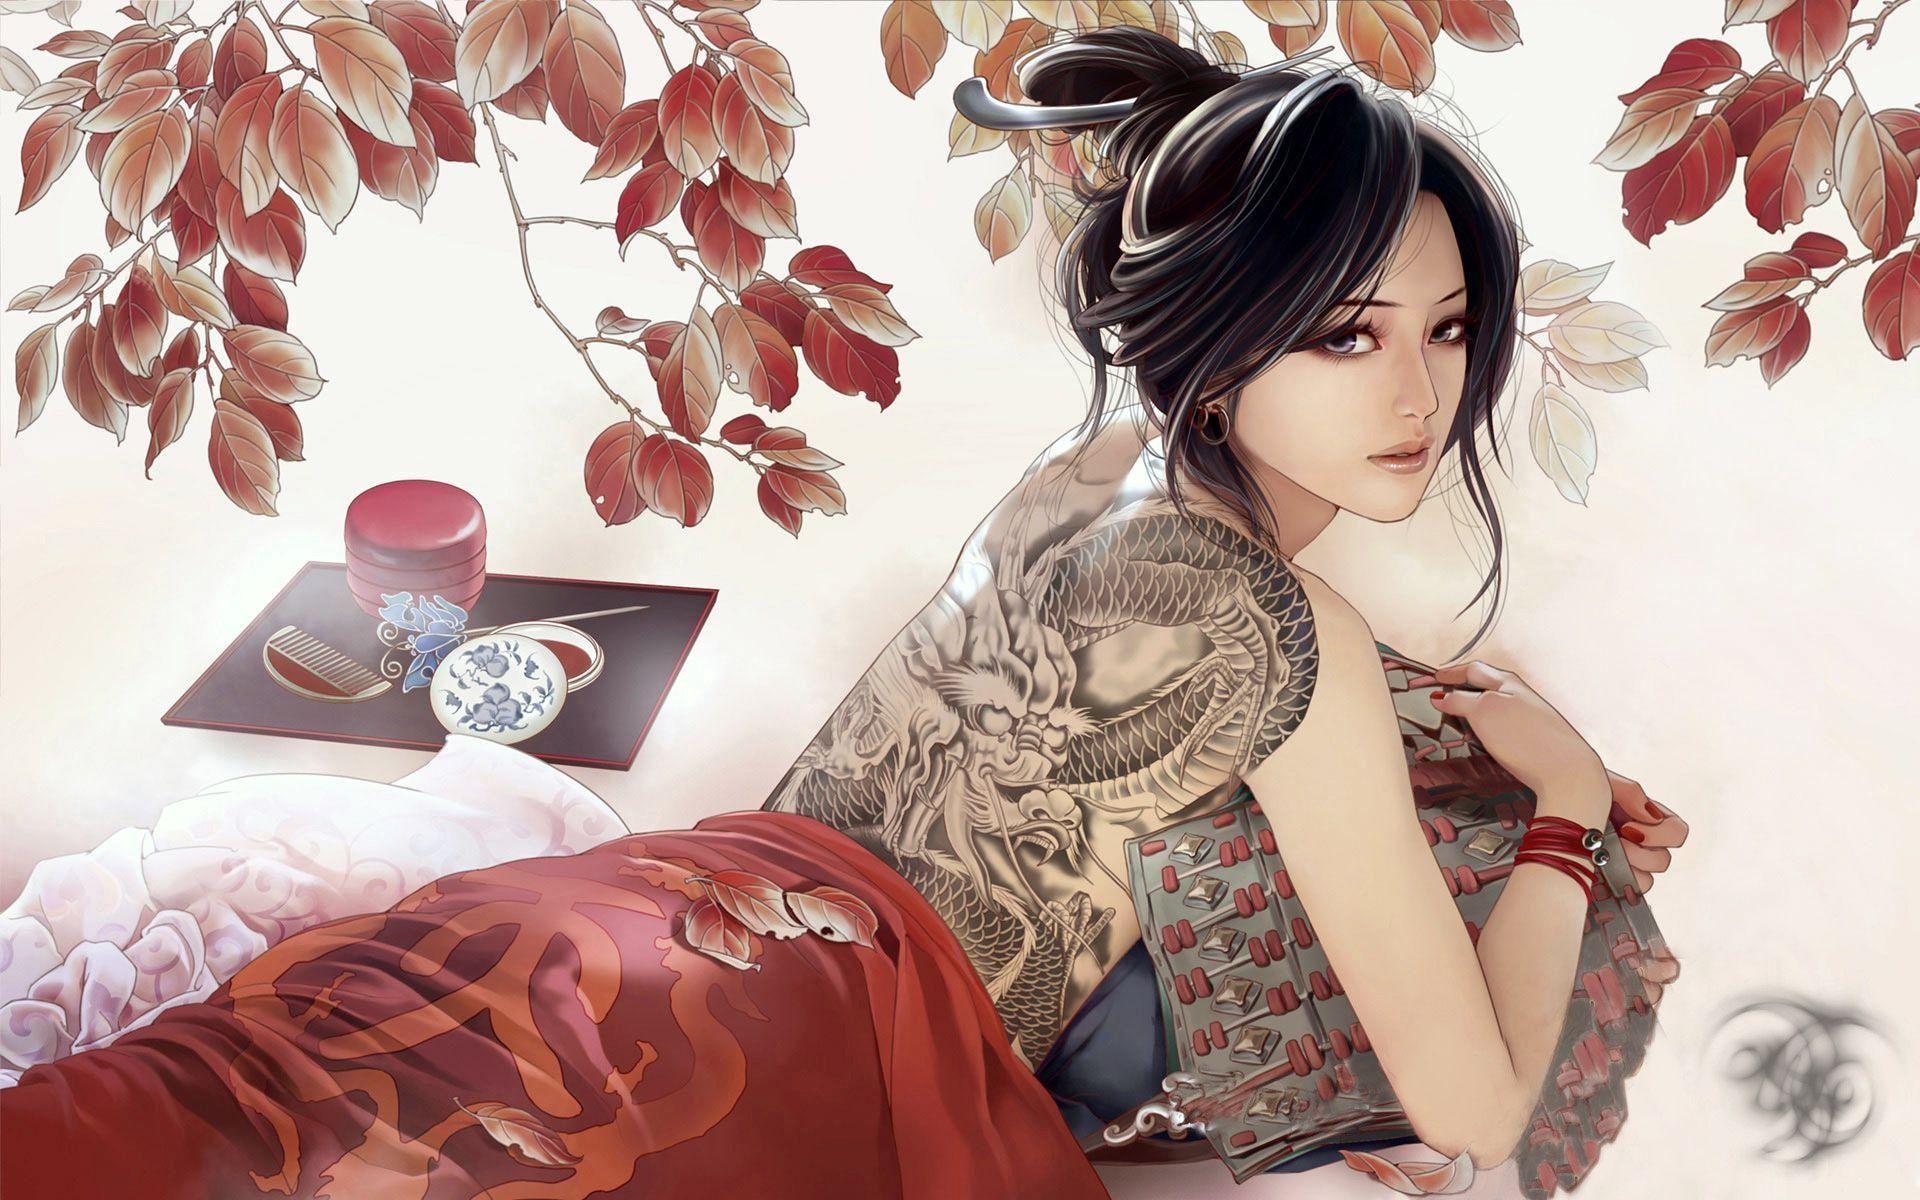 Memoirs Of A Geisha Wallpapers Top Free Memoirs Of A Geisha